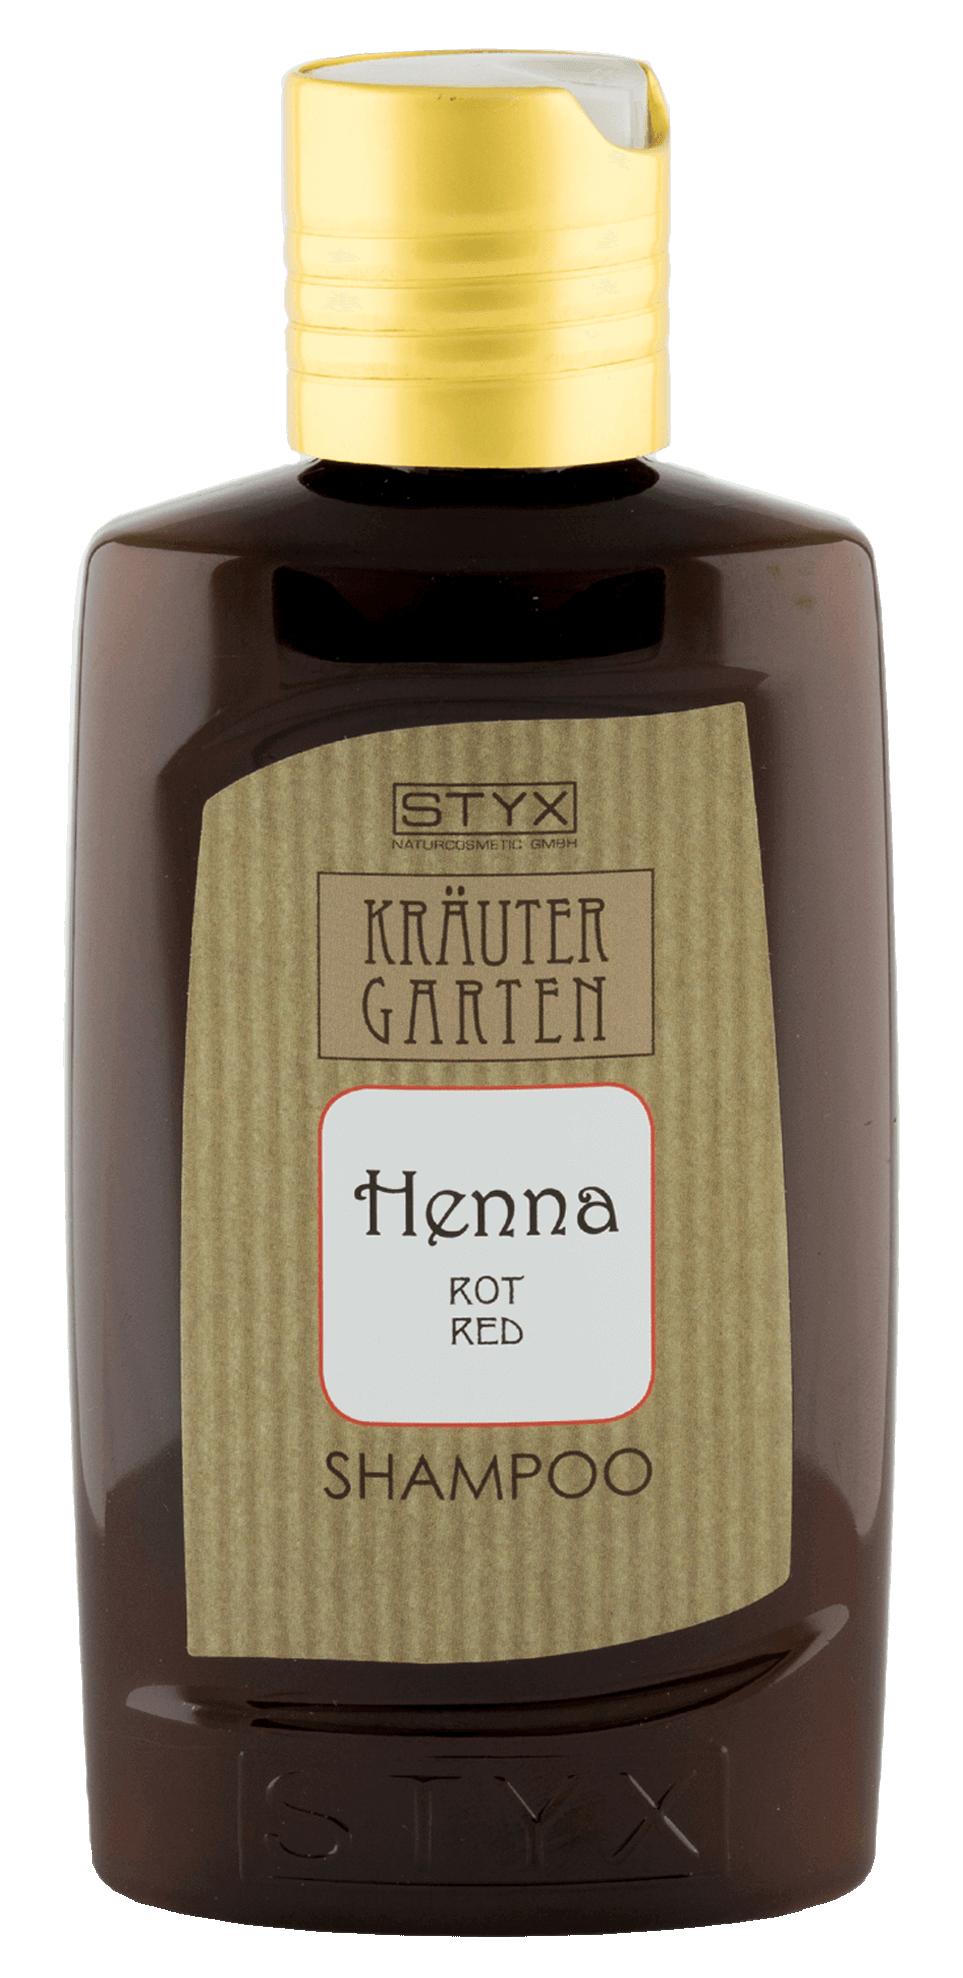 STYX NATURCOSMETIC Шампунь для волос Хенна, красный / KRAUTERGARTEN 200 мл фото